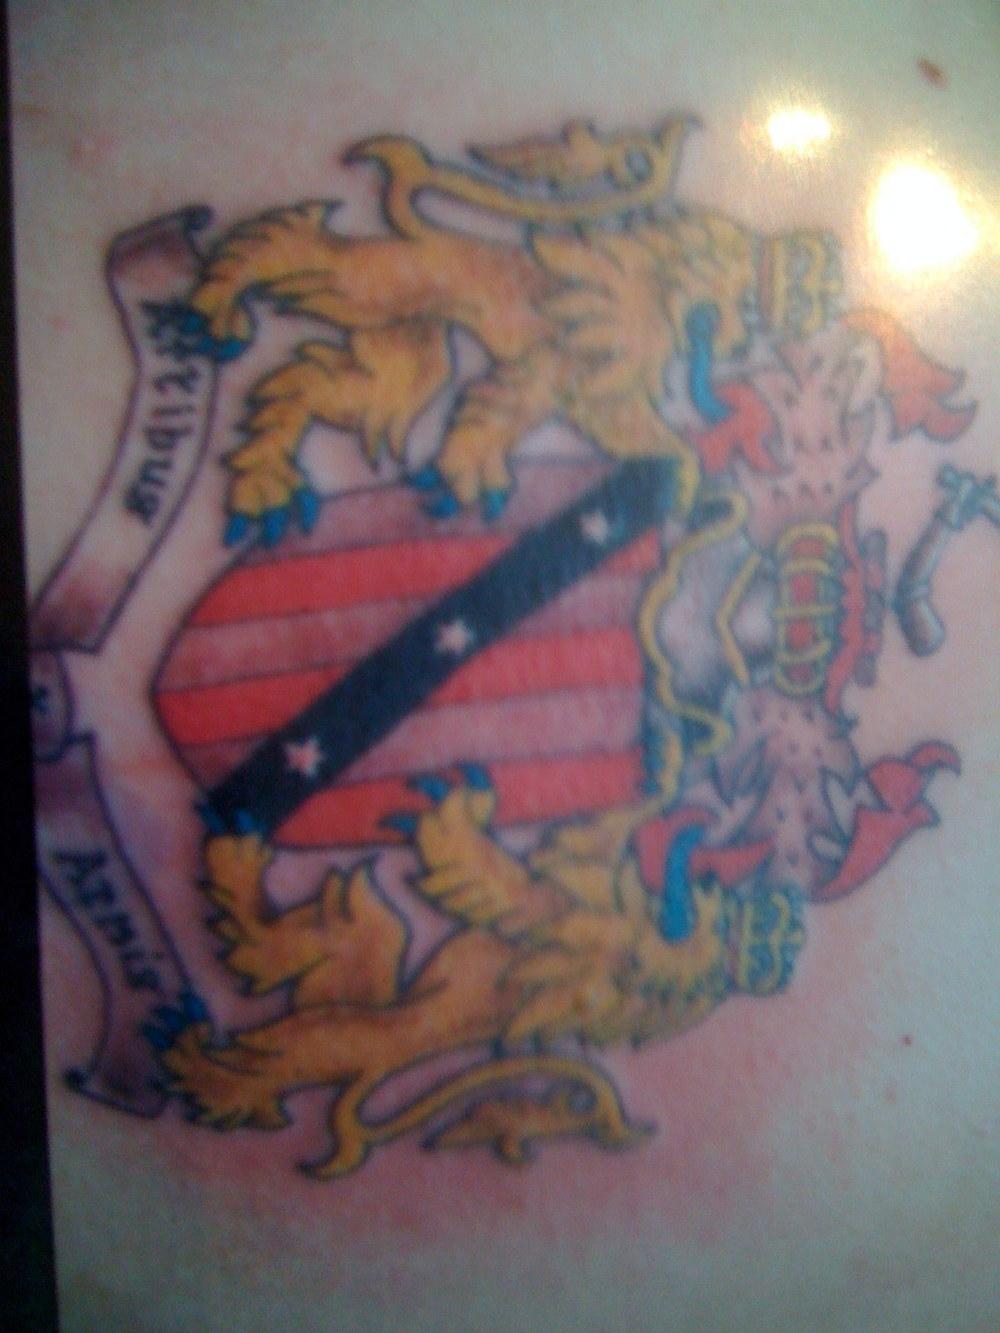 tattoos_009.jpg